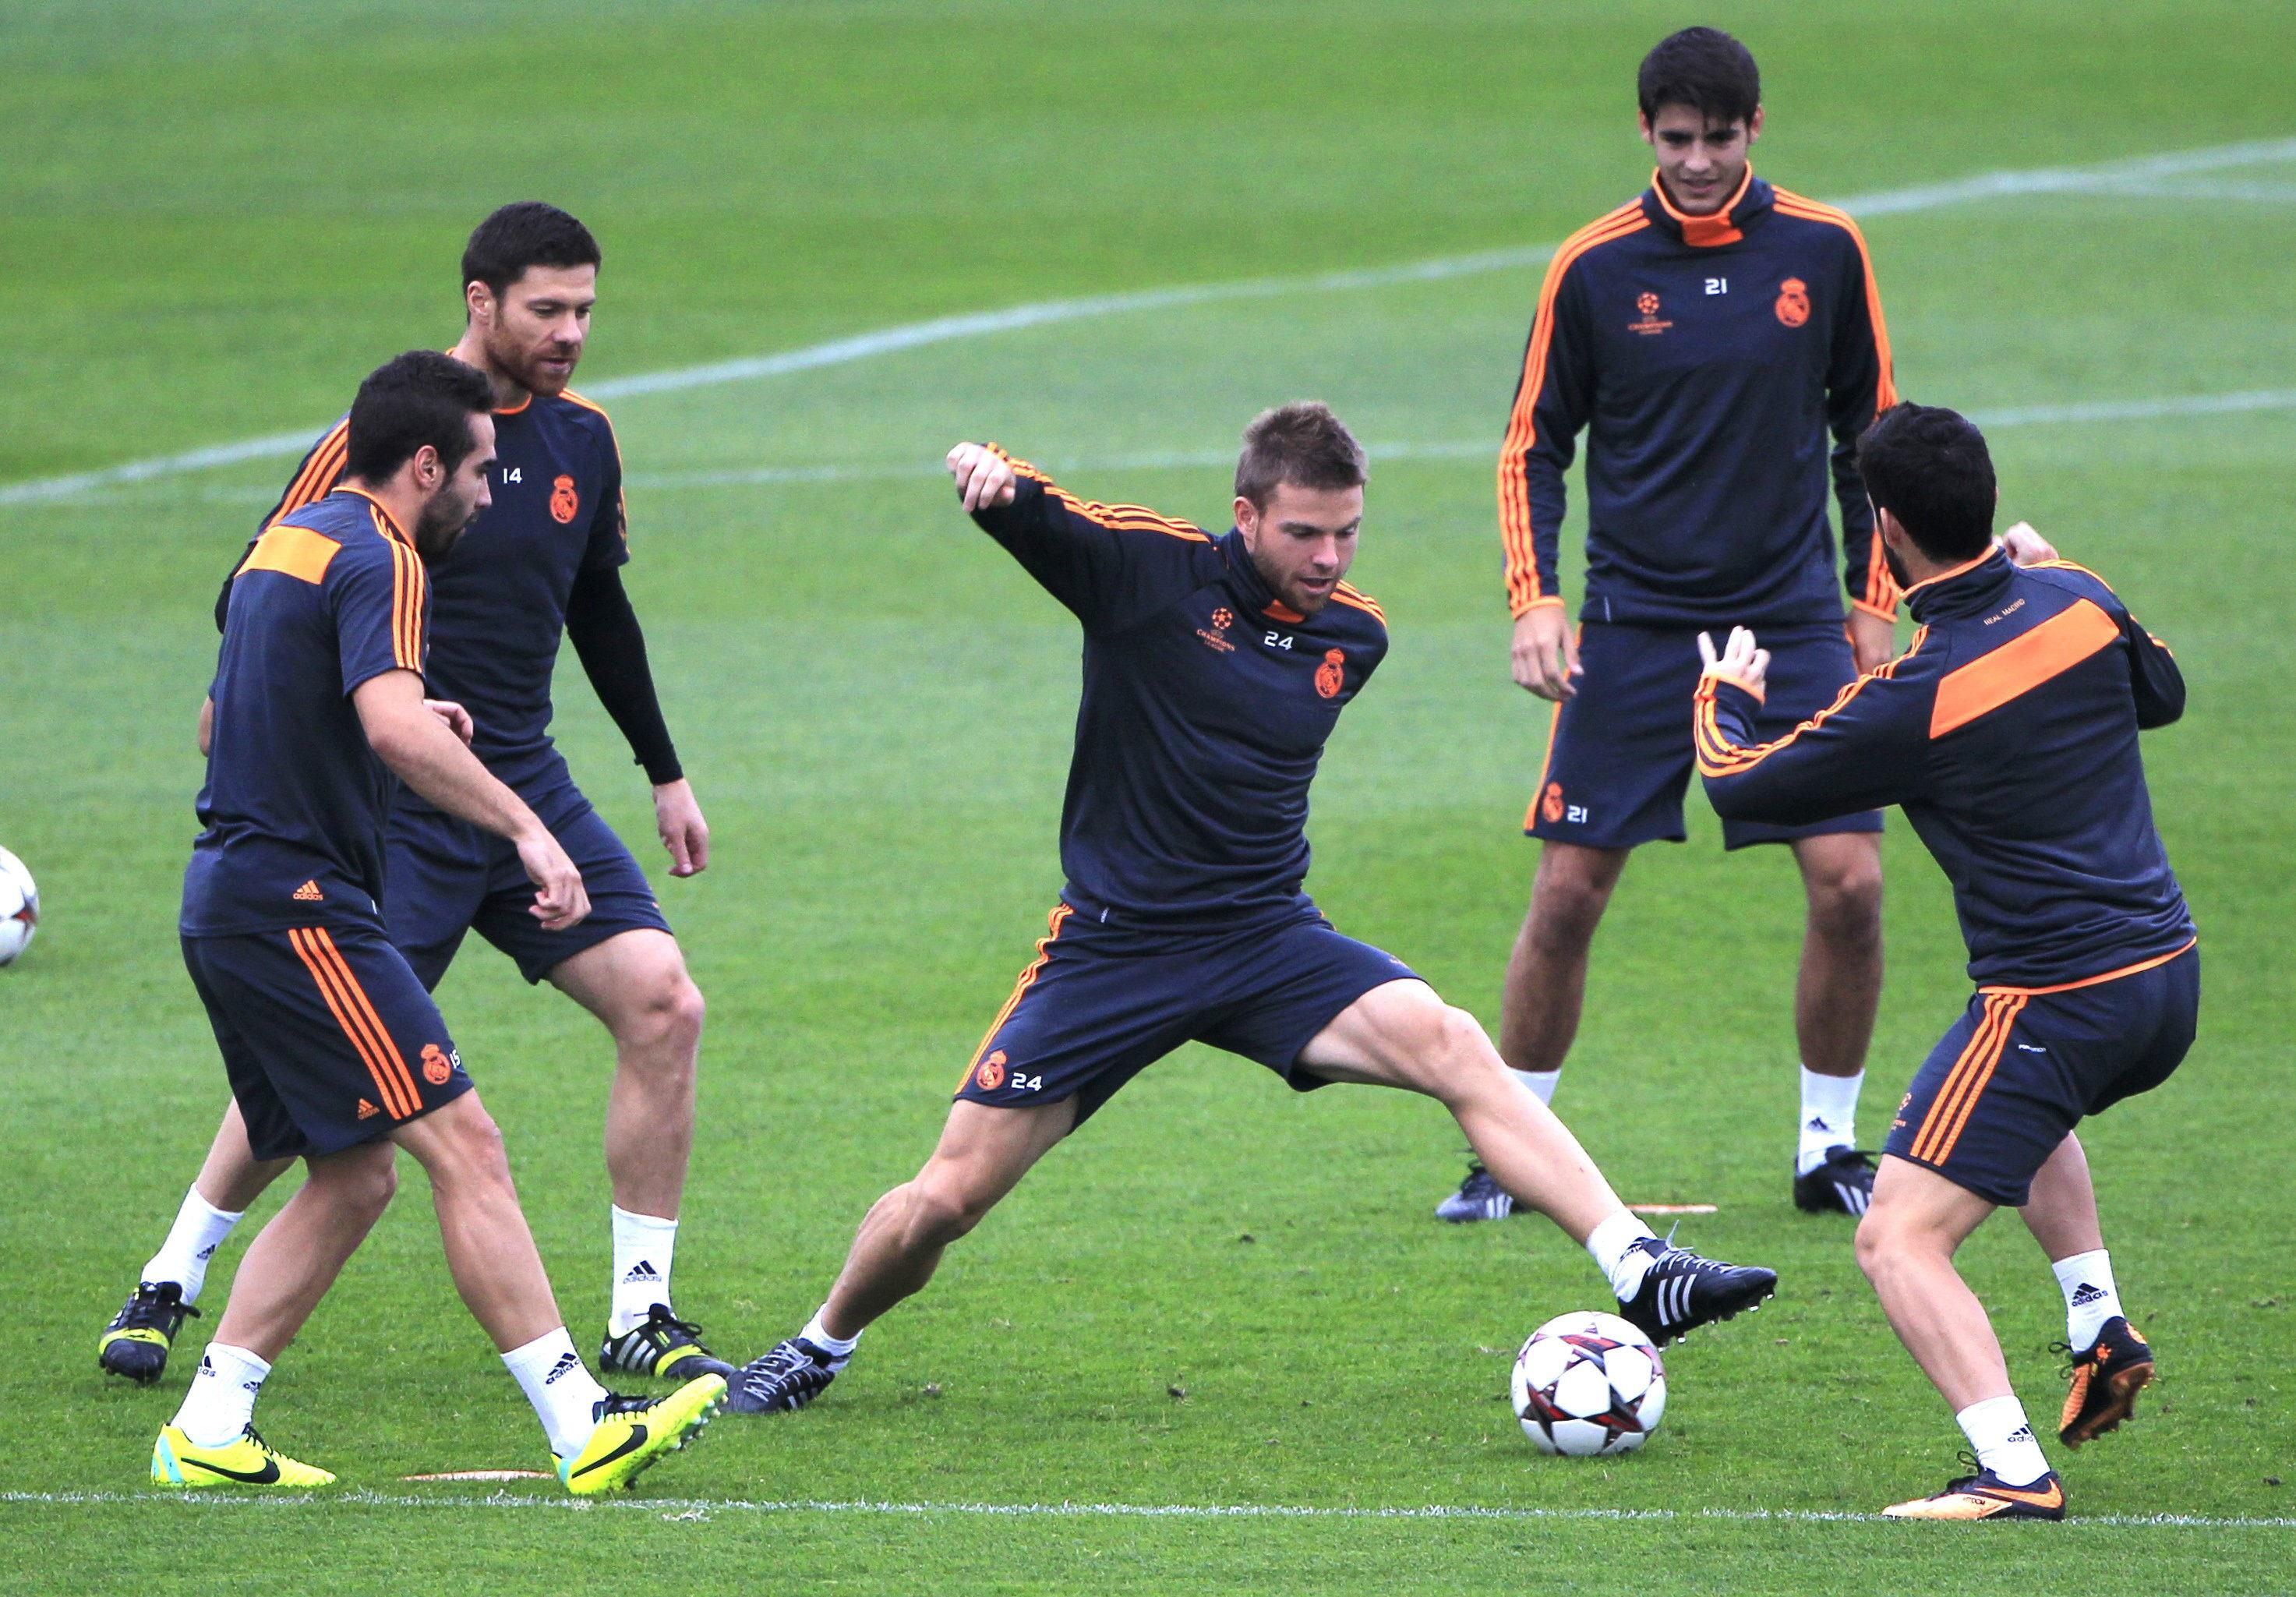 Ancelotti convoca a 22 futbolistas para la Juve, toda la plantilla salvo Xabi Alonso